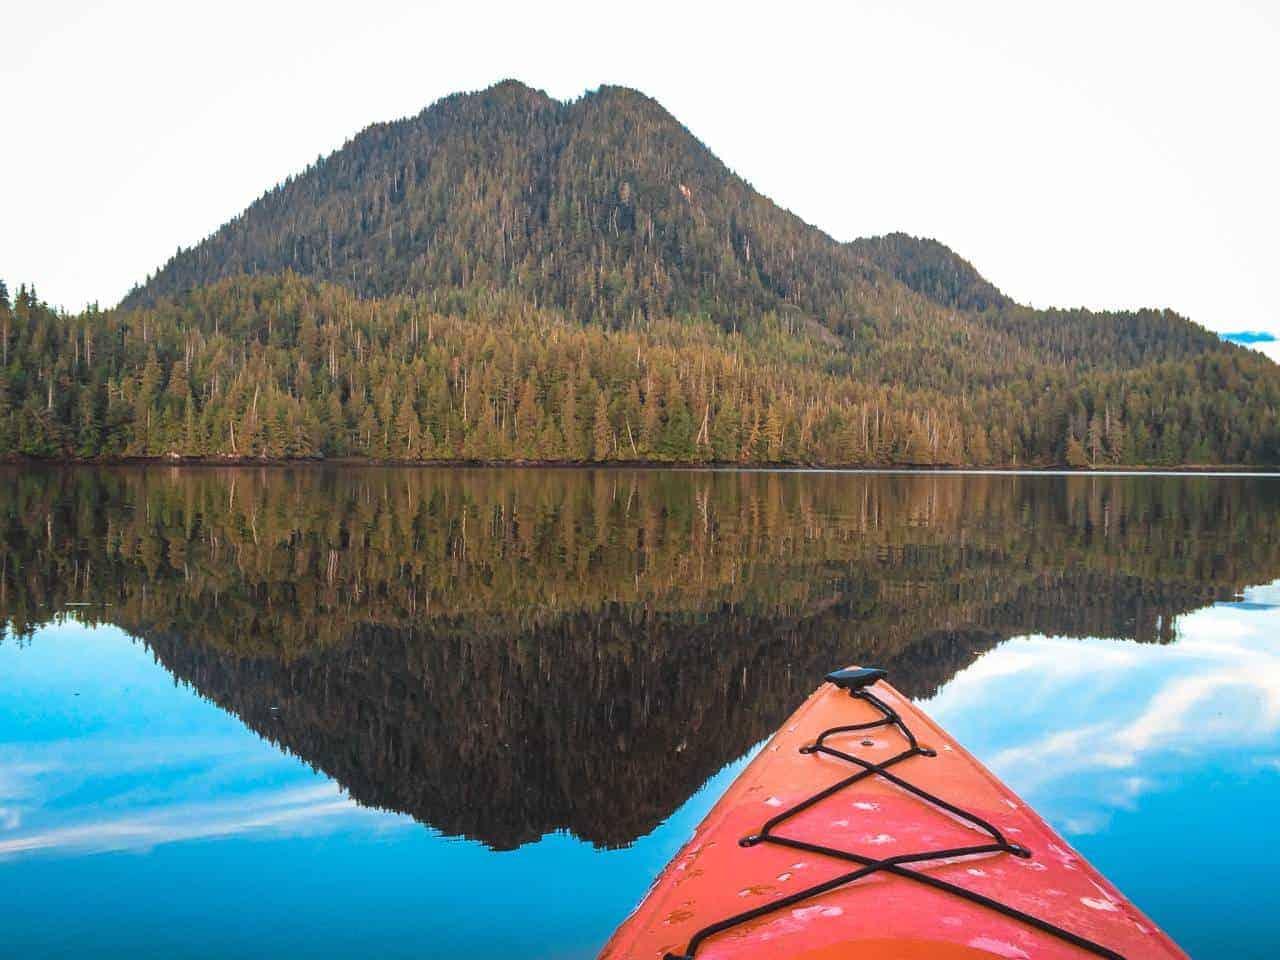 Kayaking in Prince Rupert Canada